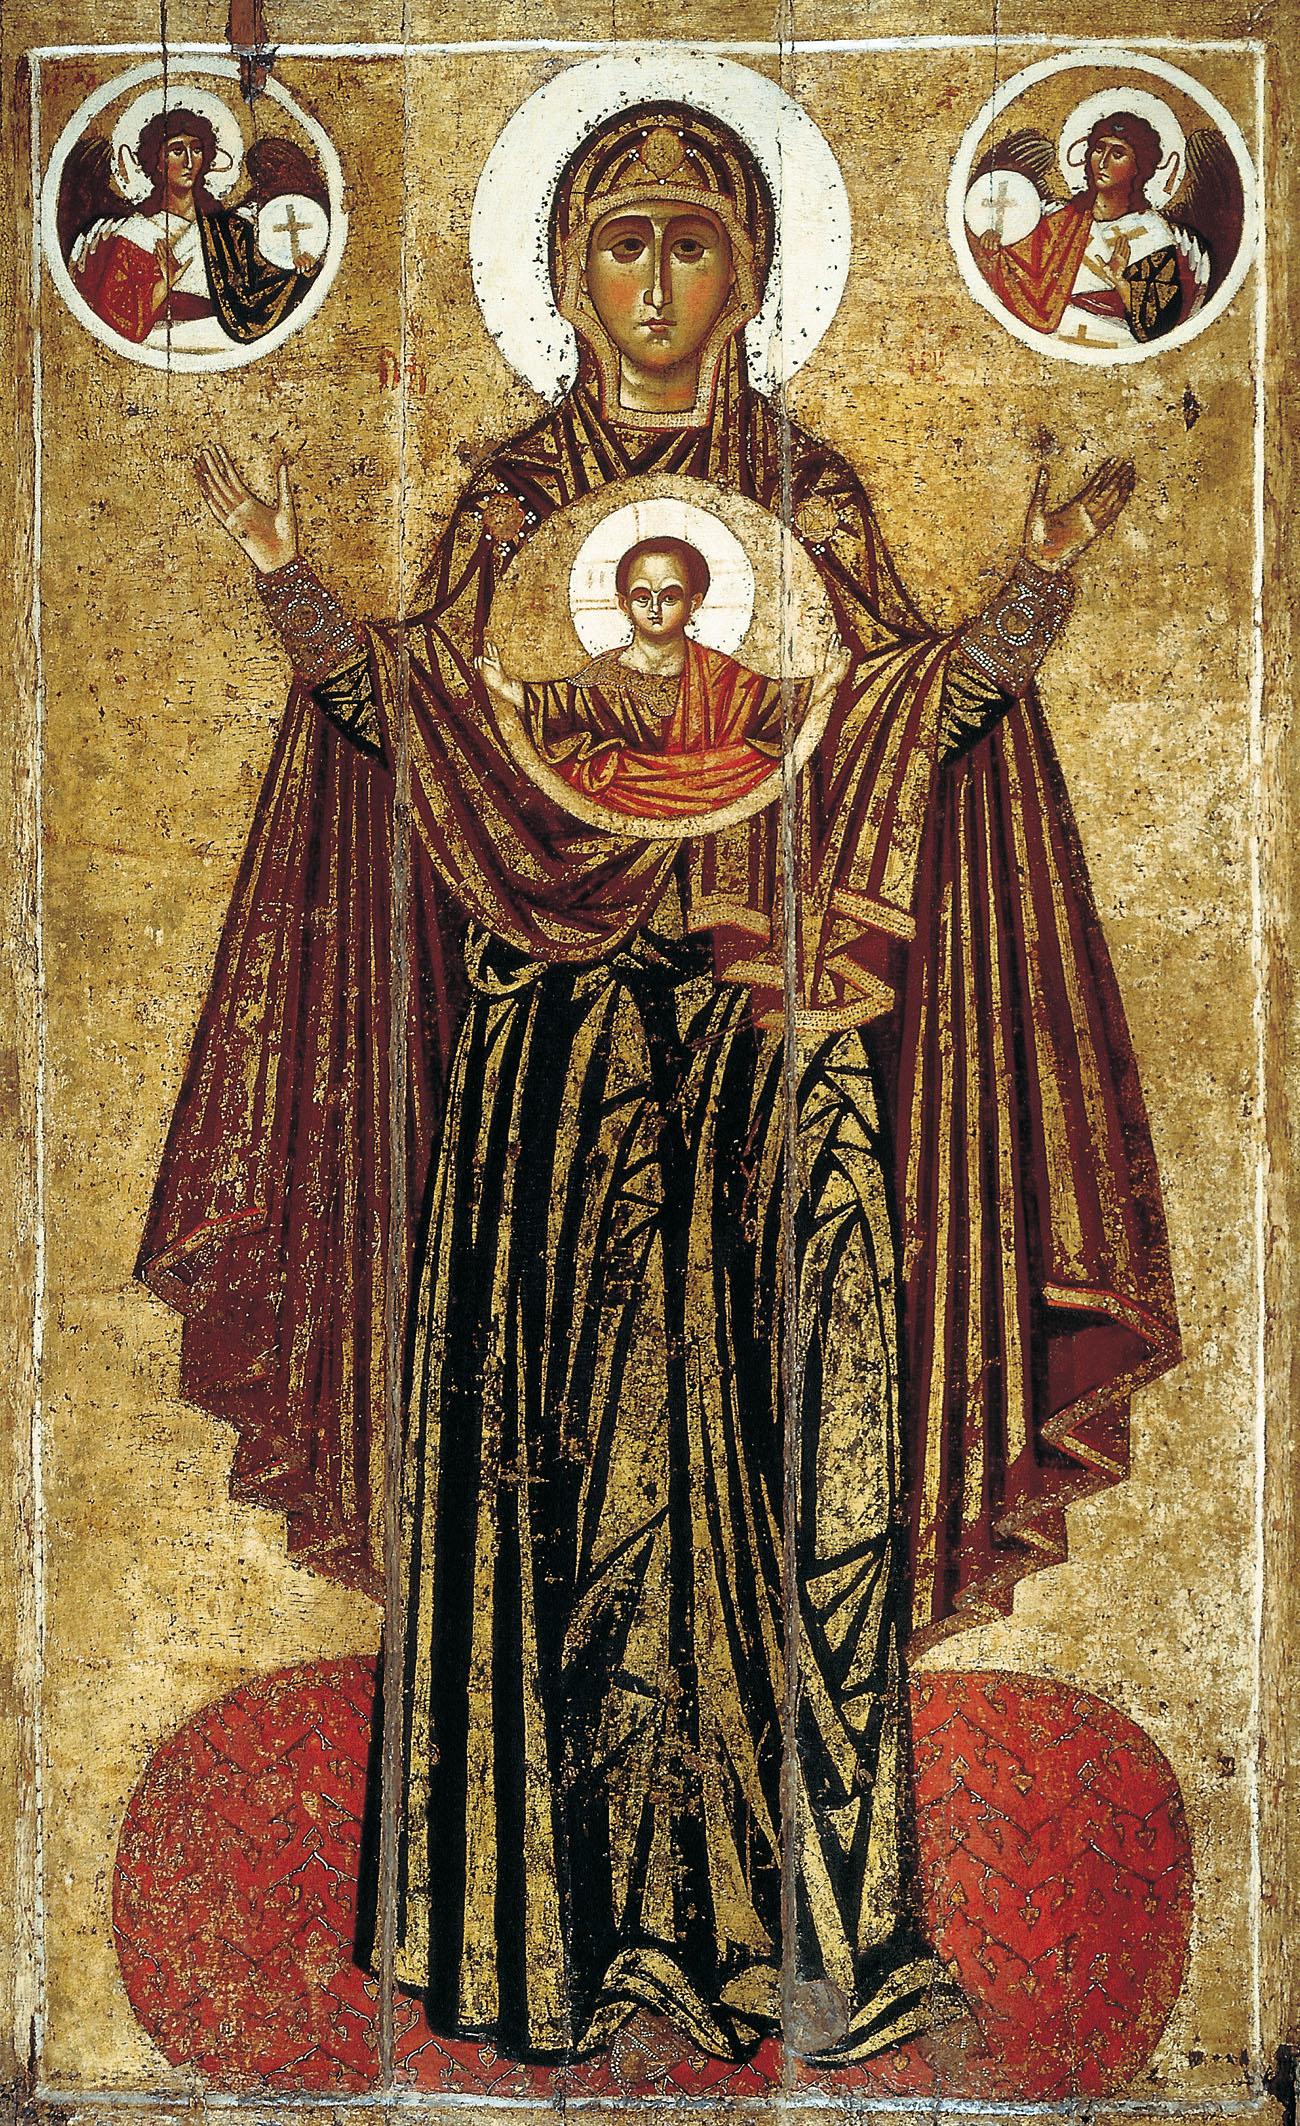 Orante d'Iaroslavl icone orthodoxe